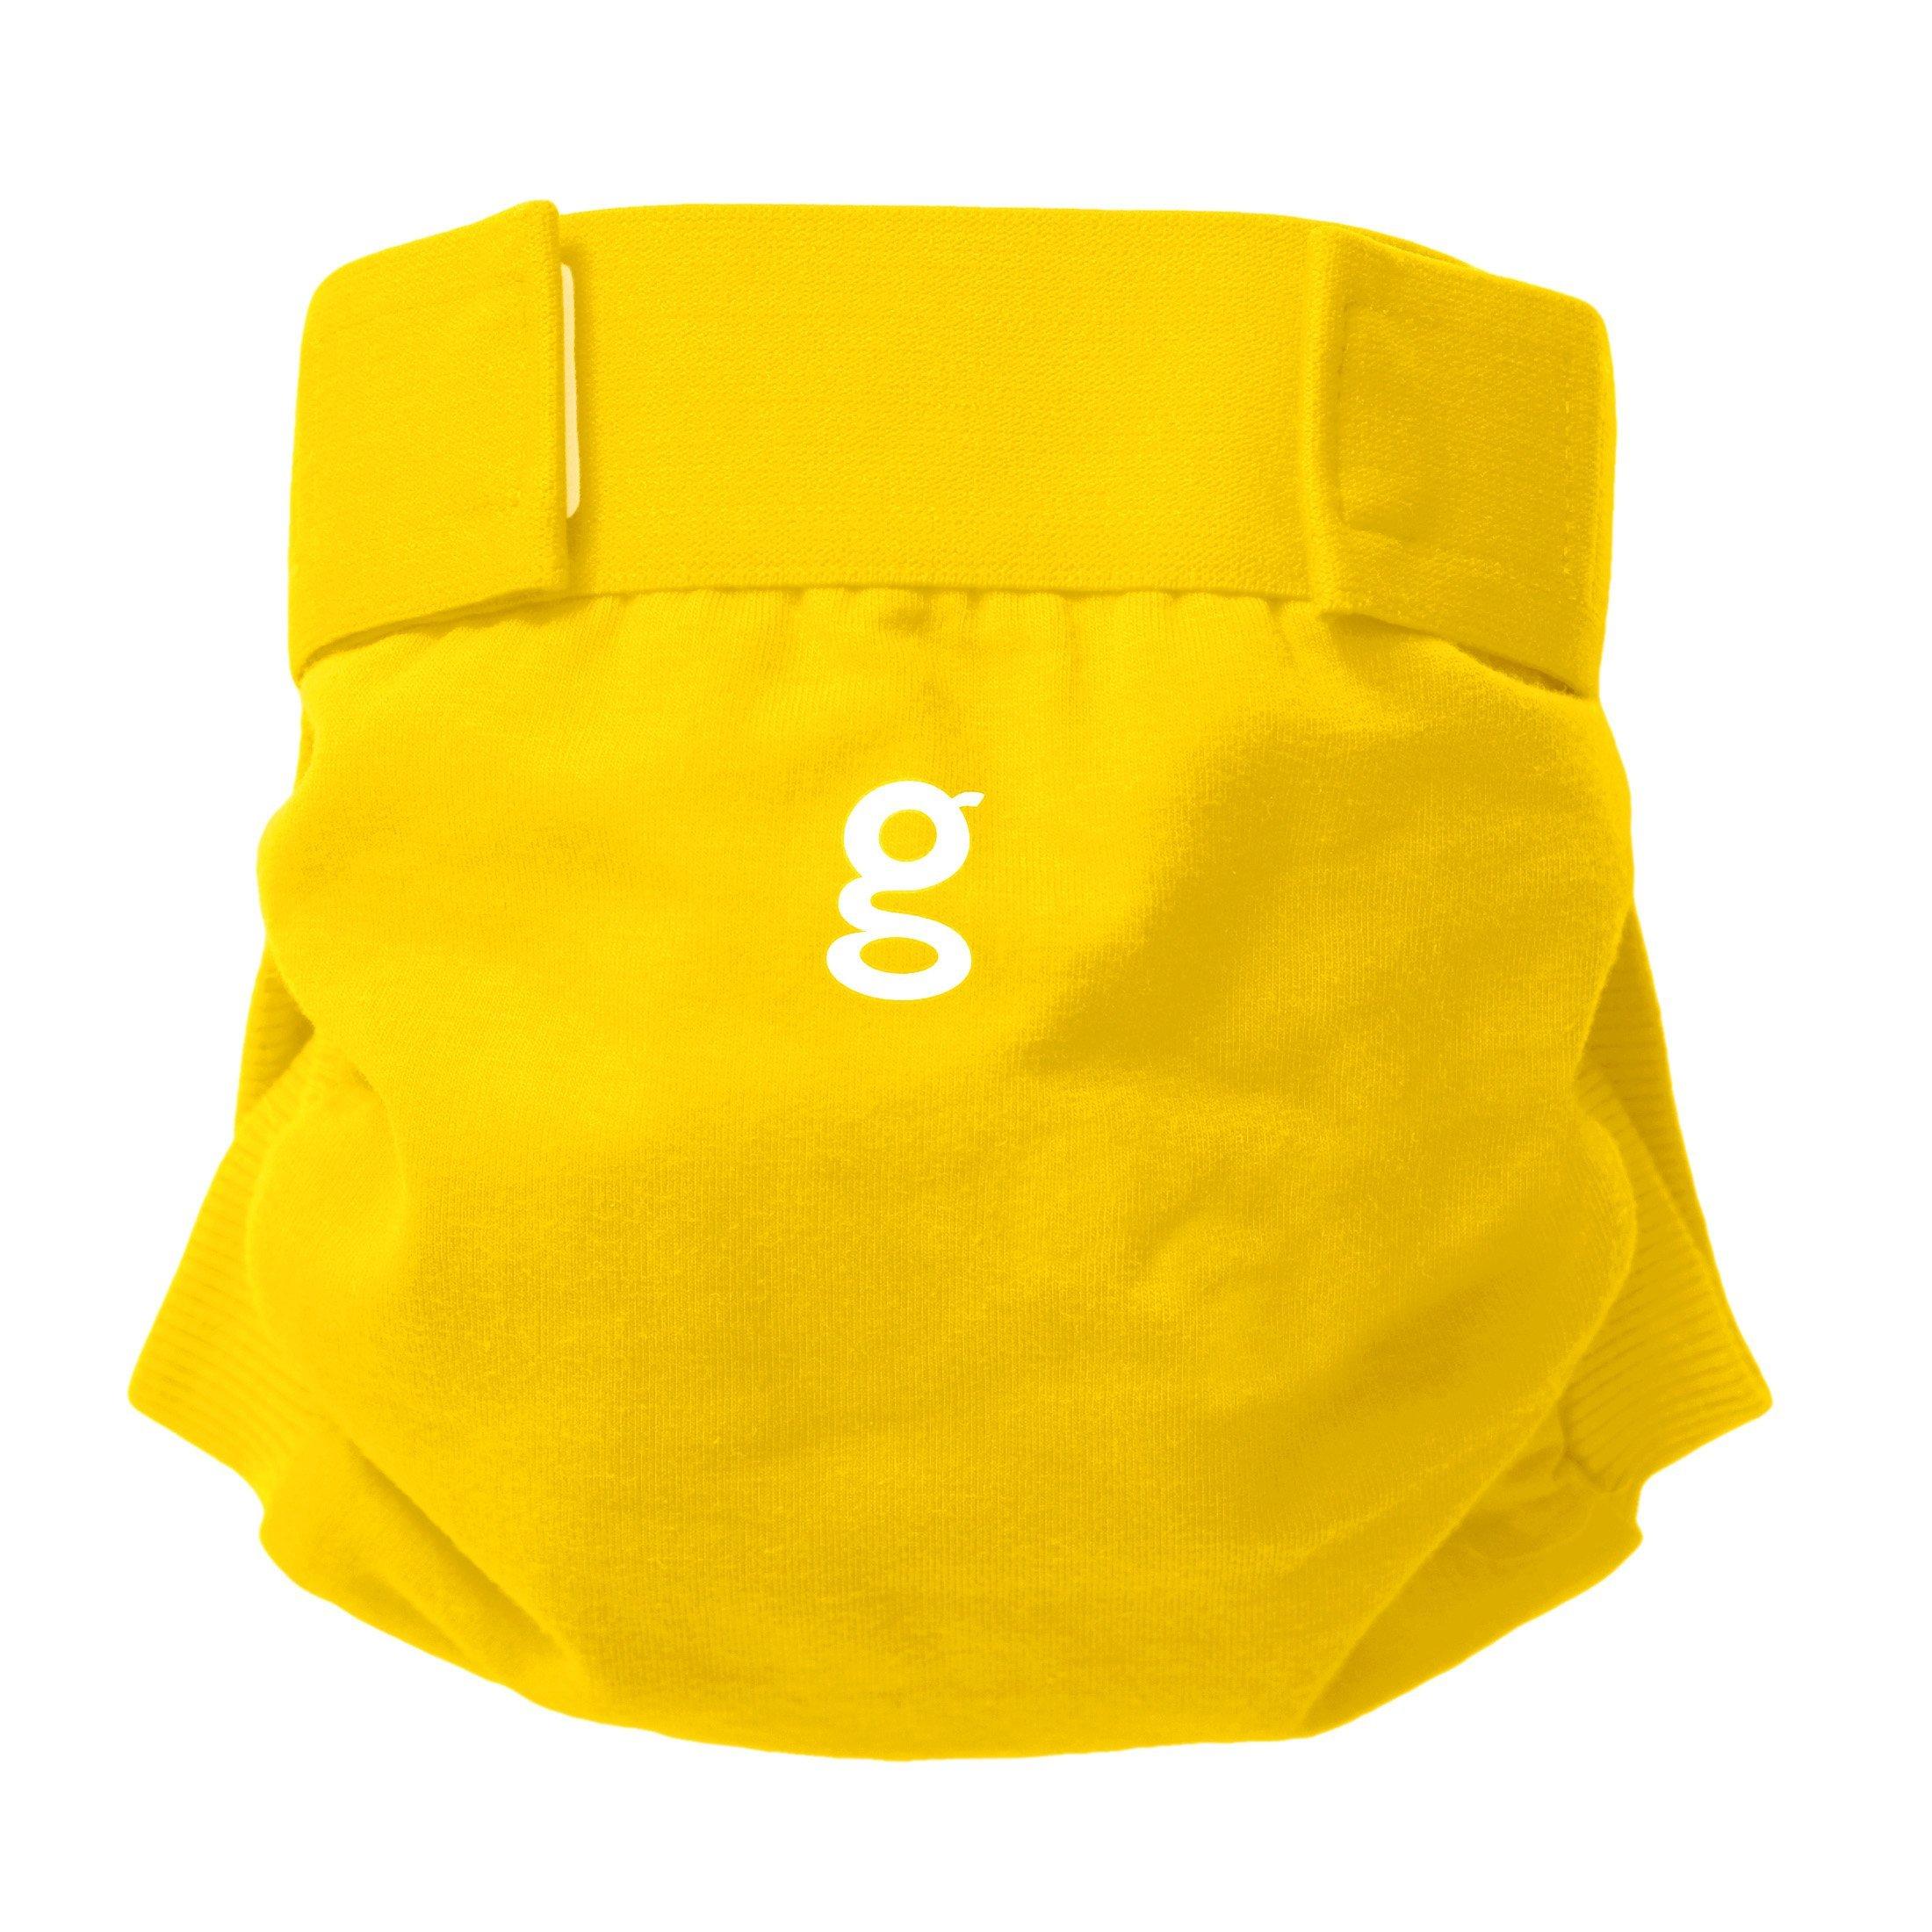 Gdiapers Good Morning Gpants, Sunshine Yellow, X-Large